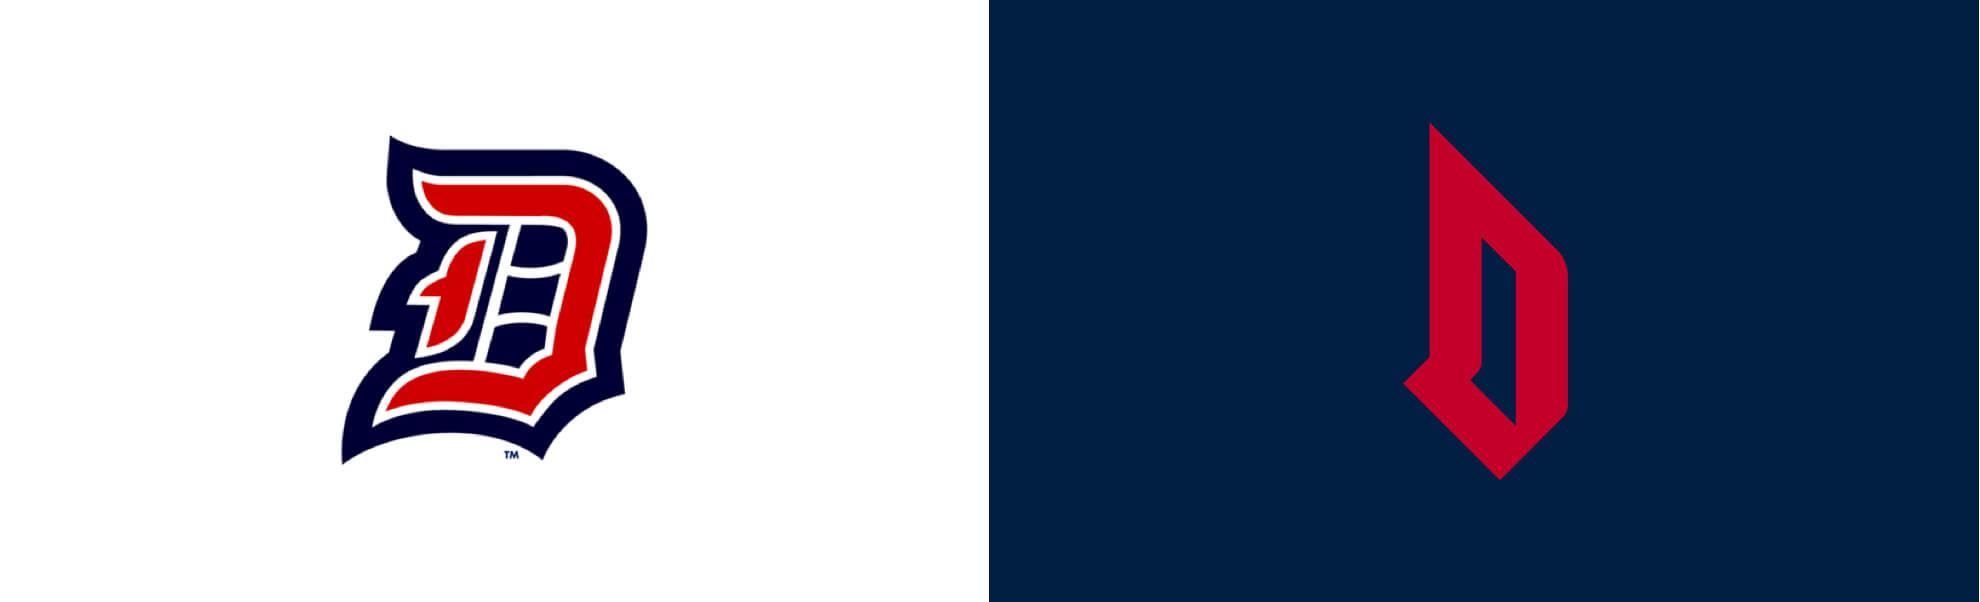 Duquesne dukes zmienia logo